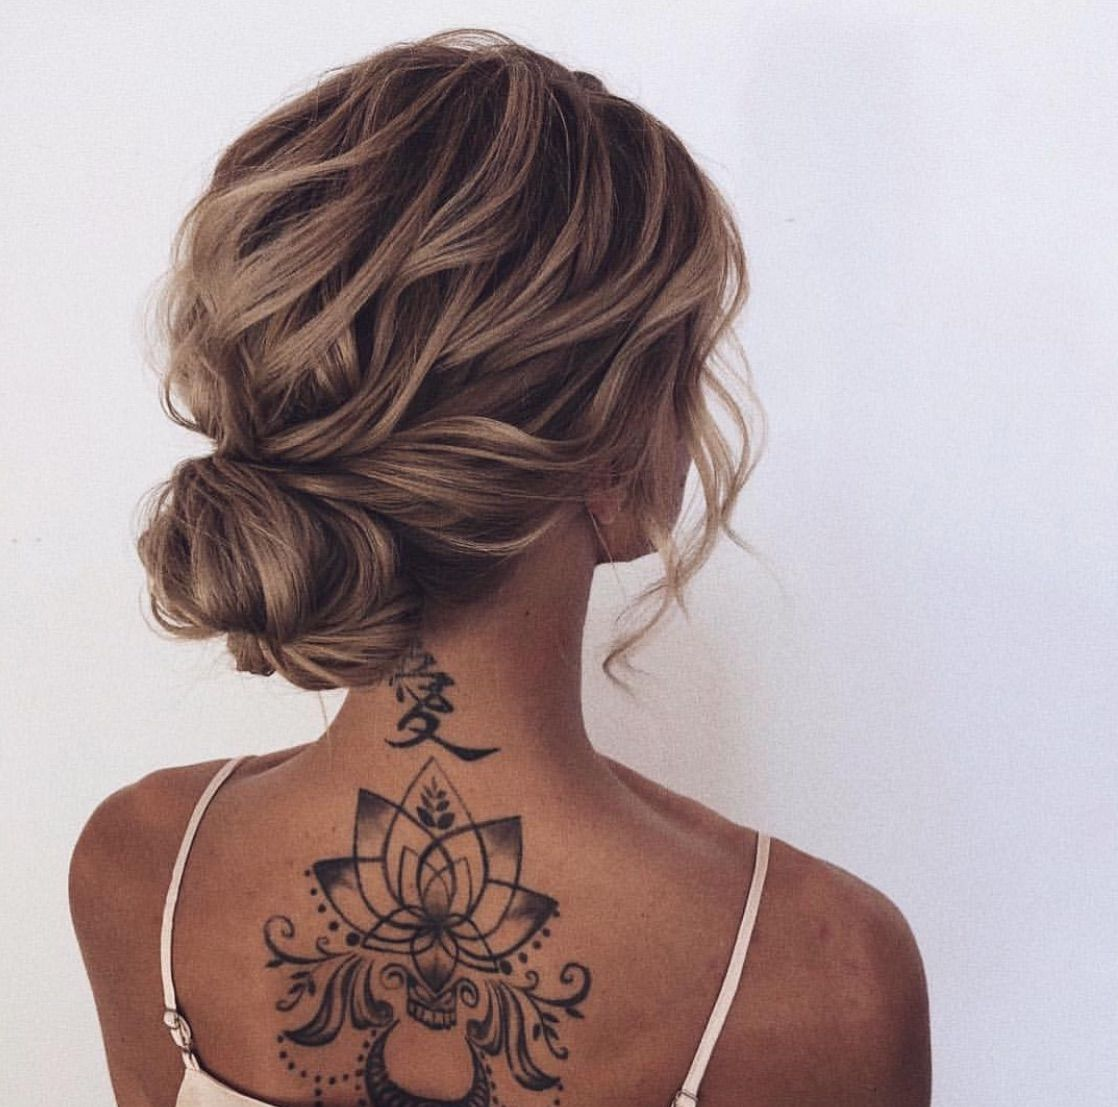 Pin By Camilla Francheschi On Am Wedding Medium Length Hair Styles Bridal Hair Updo Beautiful Wedding Hair